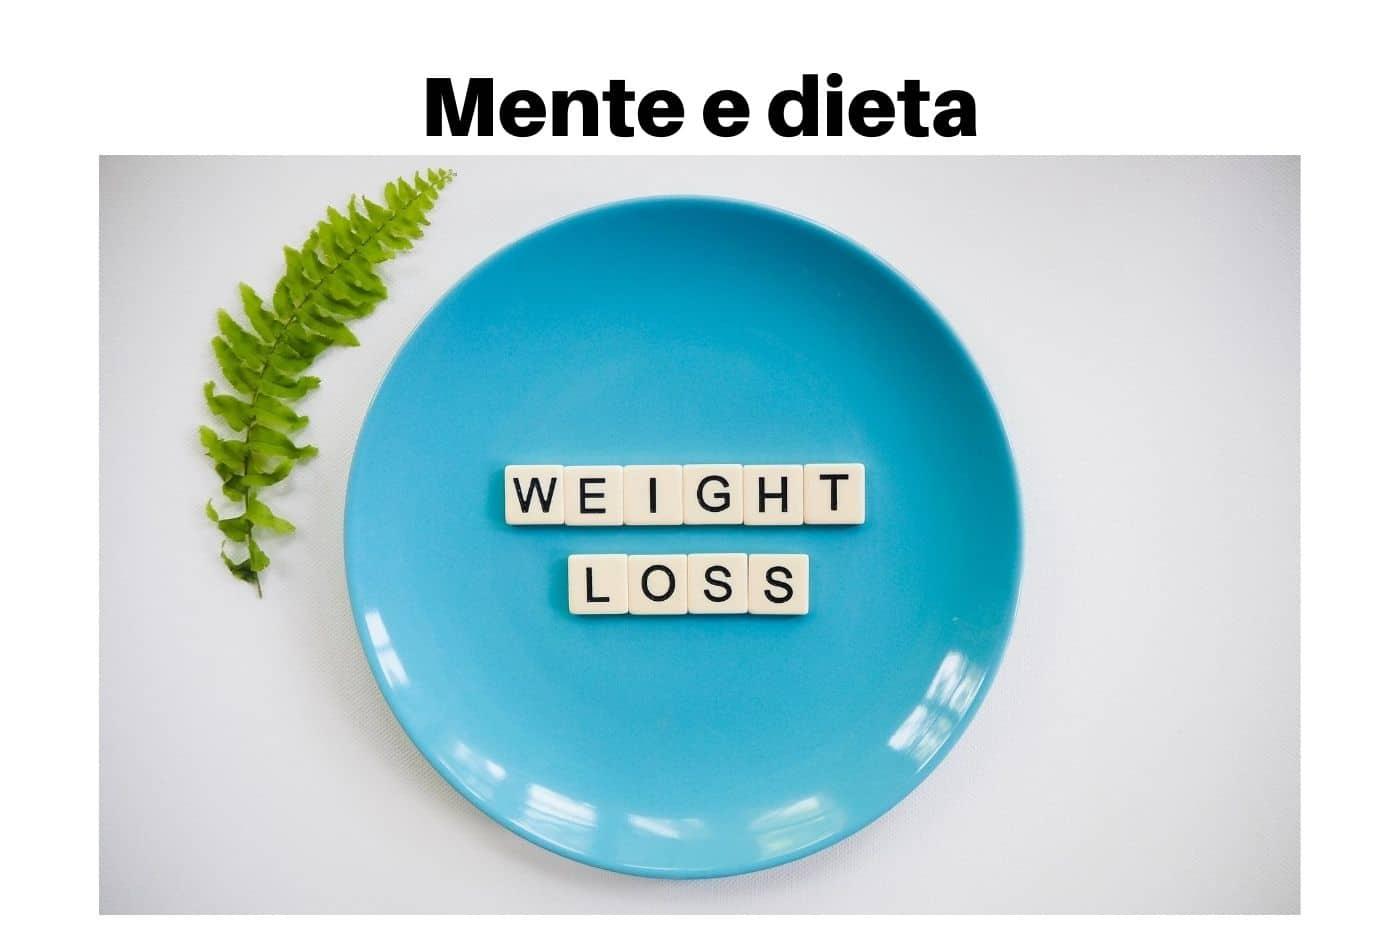 Mente e dieta.